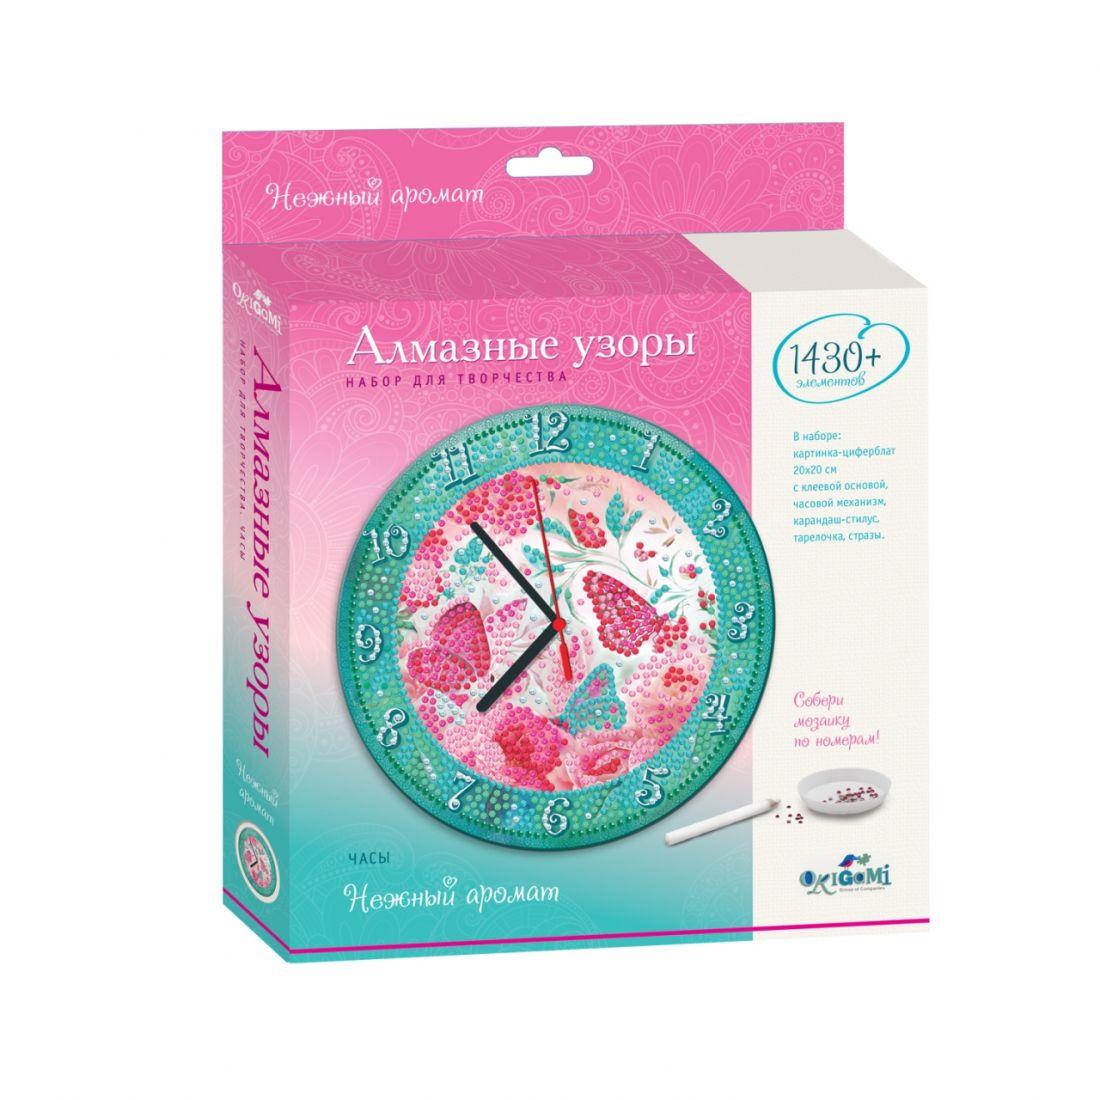 Алмазная мозаика ORIGAMI 04736 Часы нежный аромат